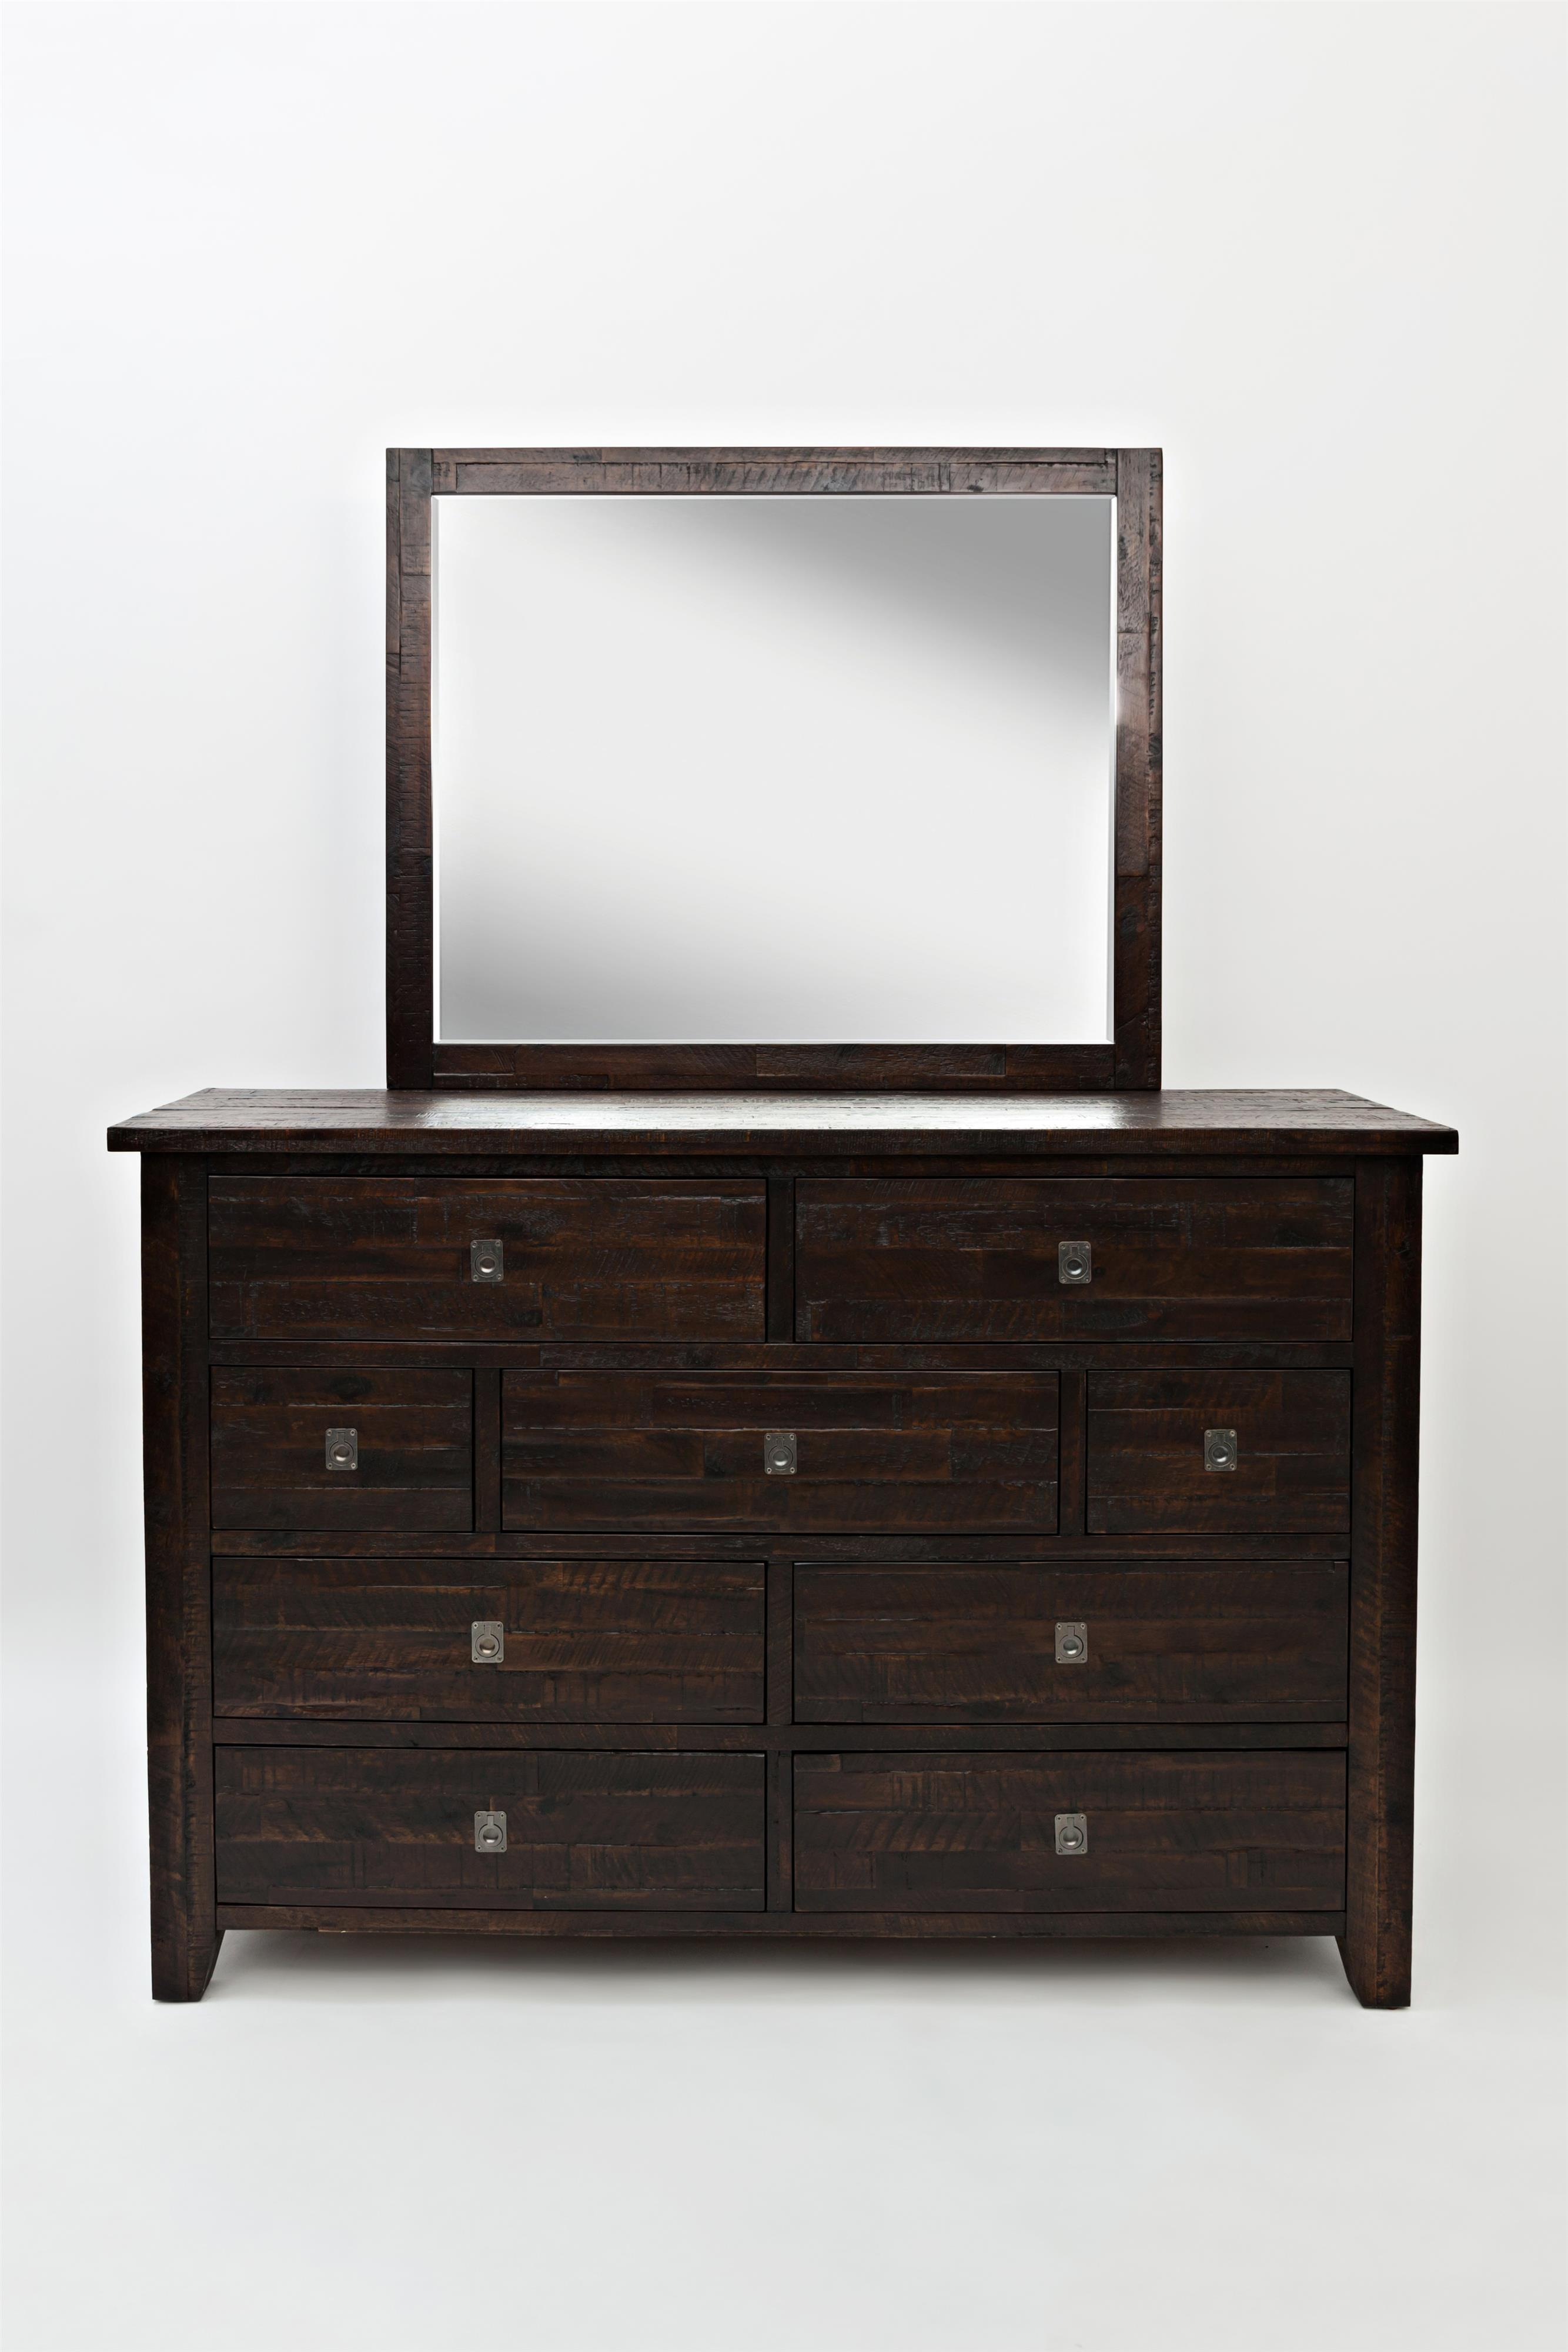 Kona Grove Dresser and Mirror by Jofran at Fine Home Furnishings